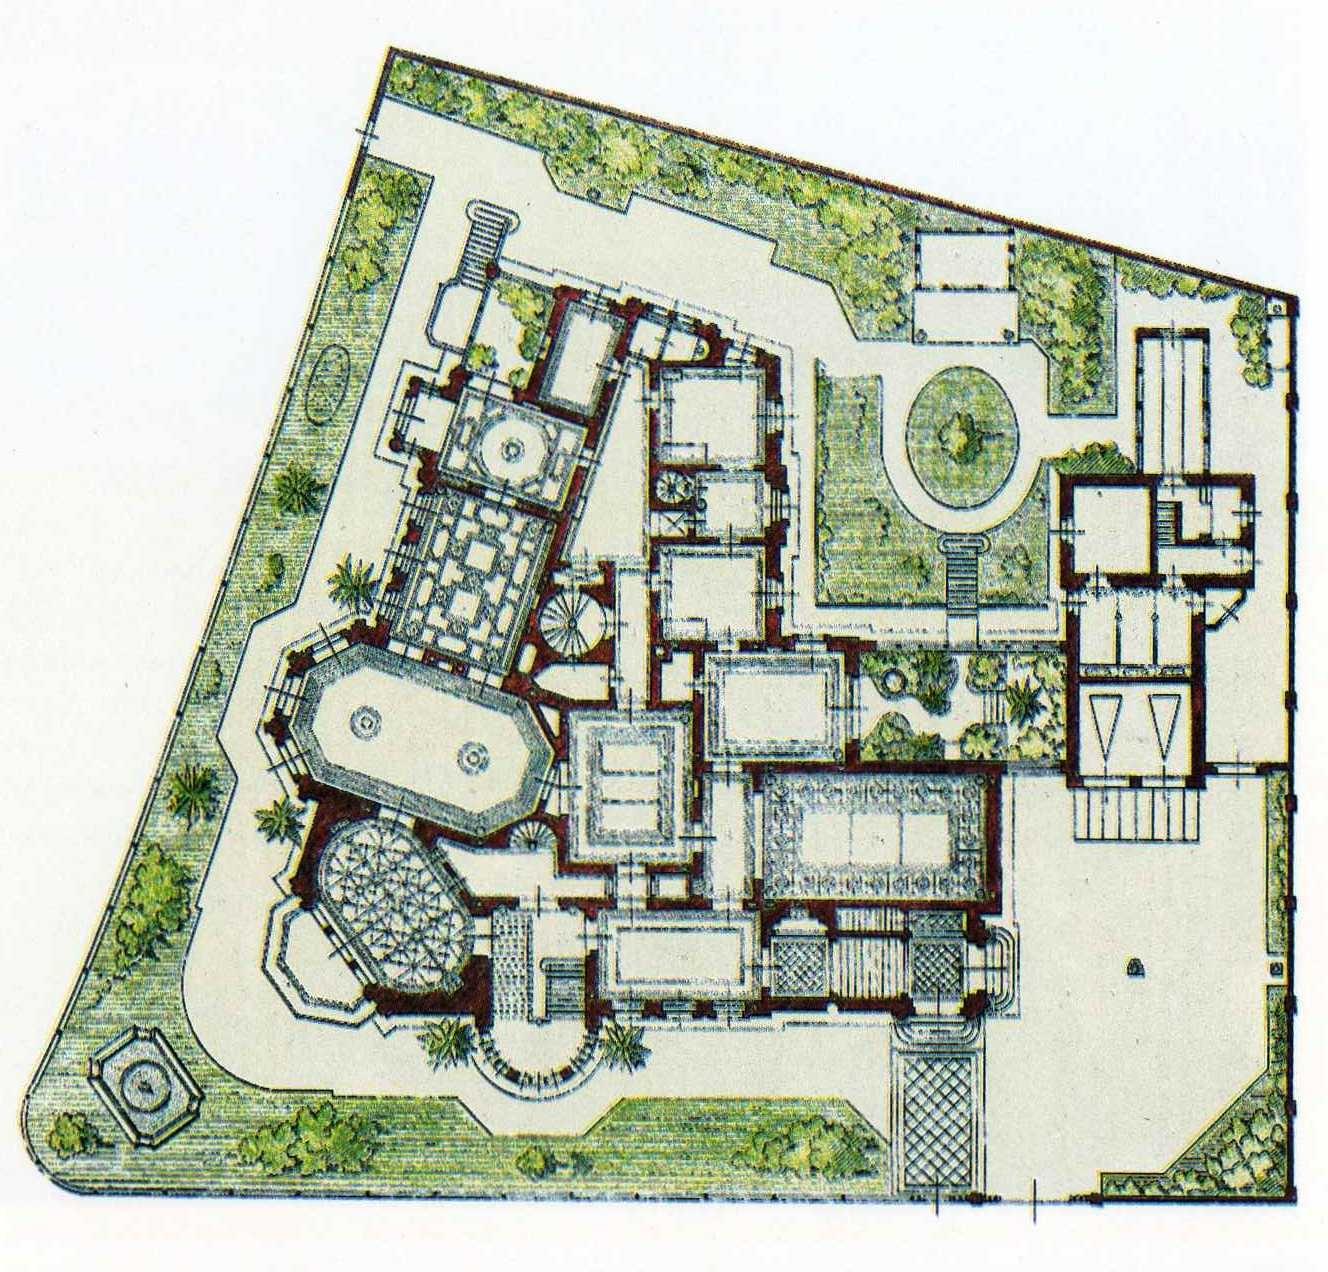 File:Dresden Villa Beuststraße 1, Grundriss - Helas 1999, S. 111 ... size: 1328 x 1272 post ID: 3 File size: 0 B